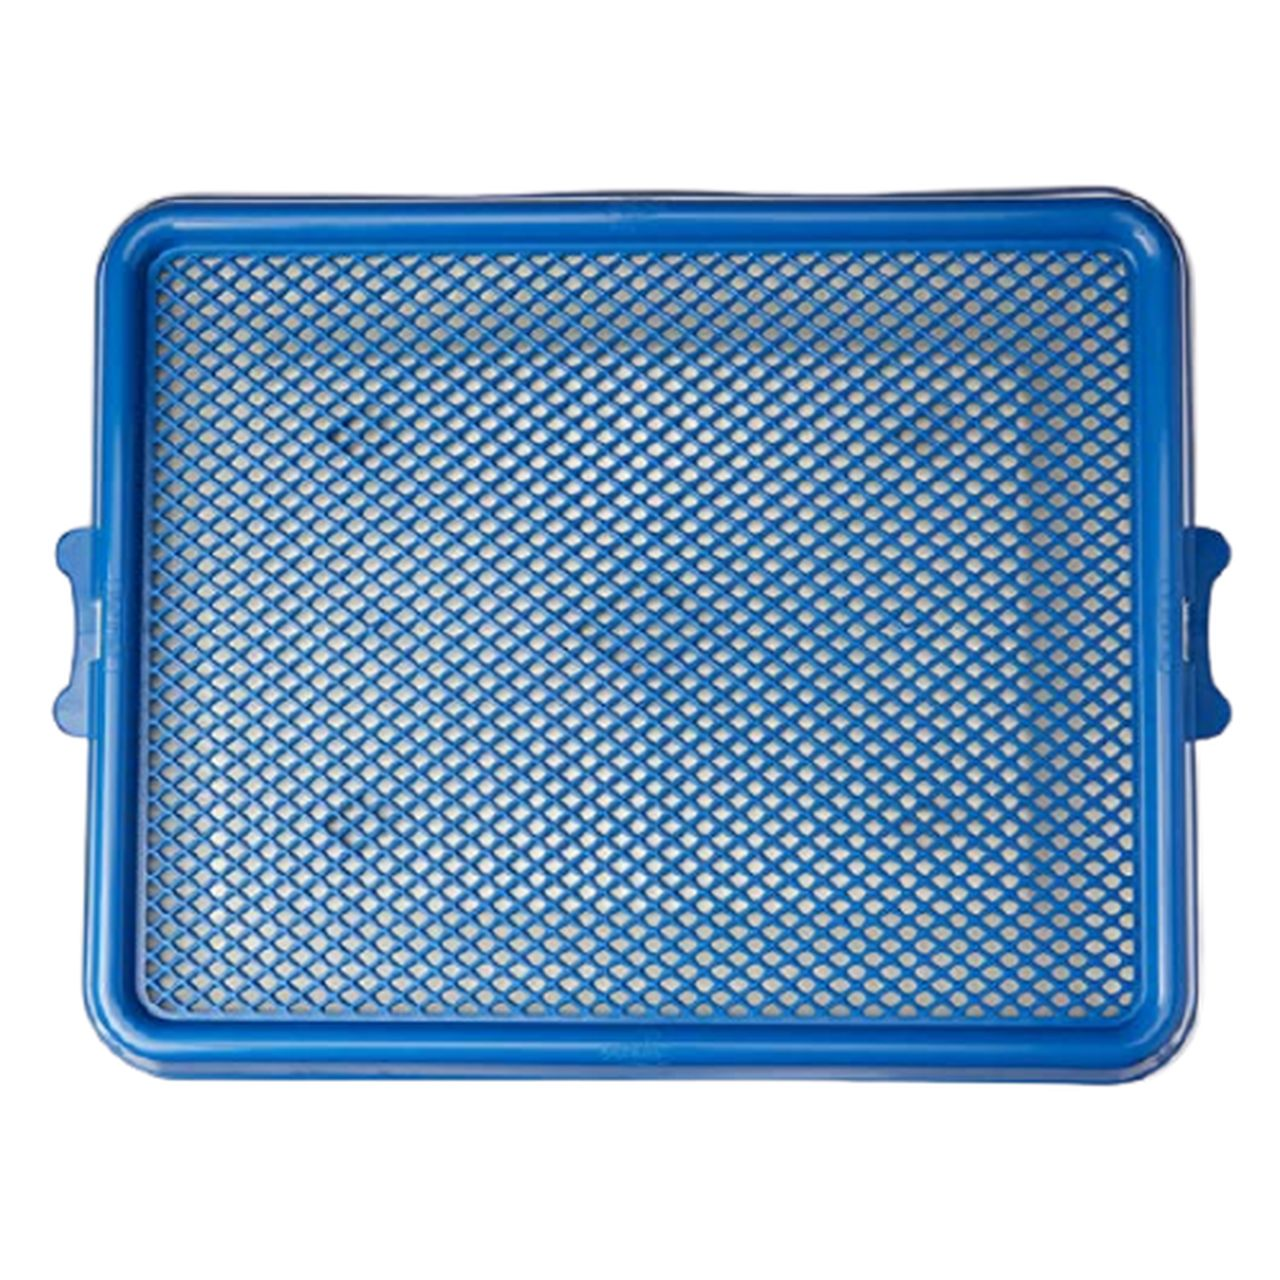 Sanitário Higiênico Pet Injet Xixi Pets Premium Azul